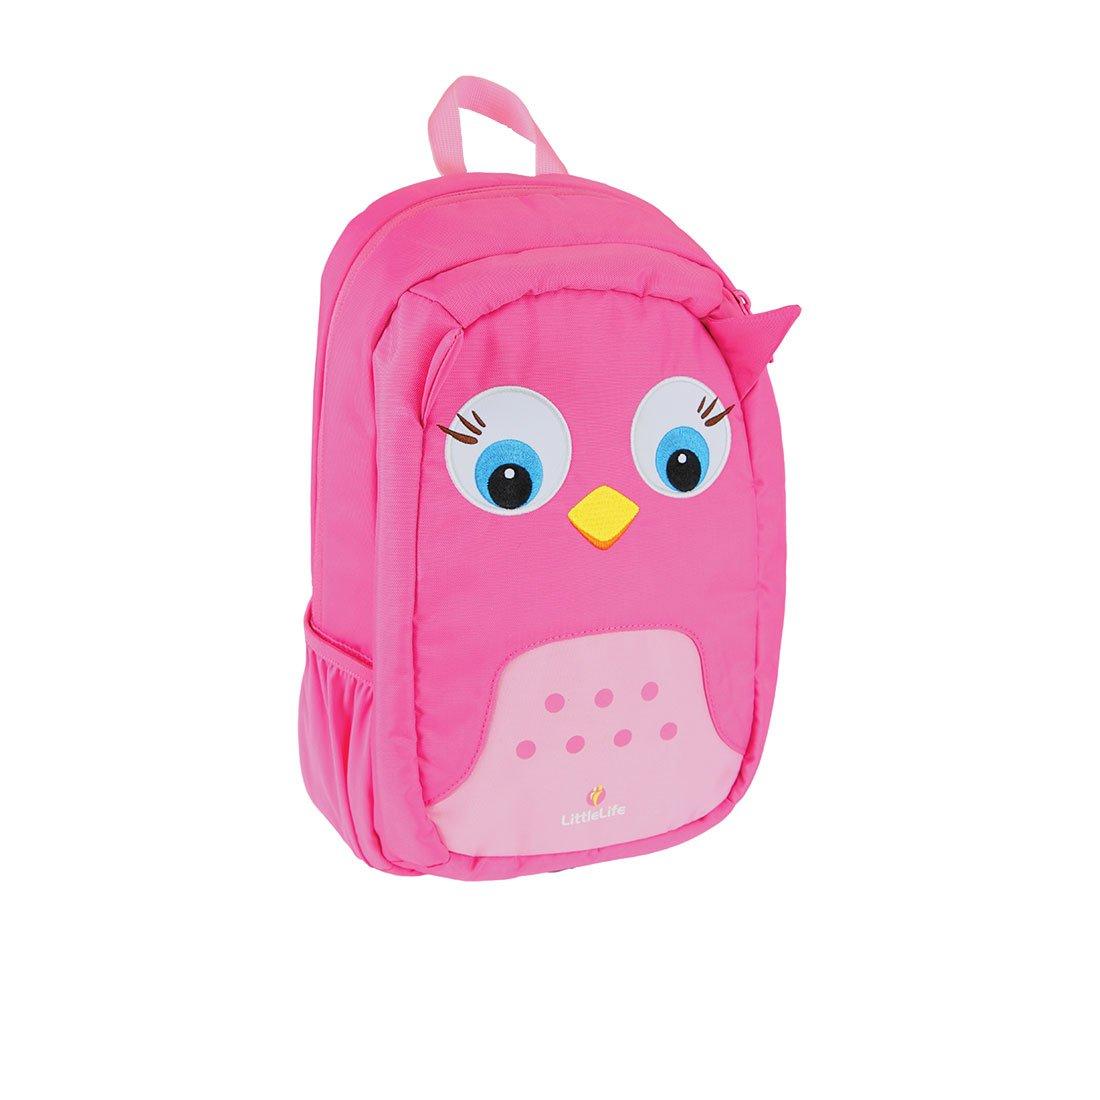 Owl School Bag Kids School Bags Littlelife